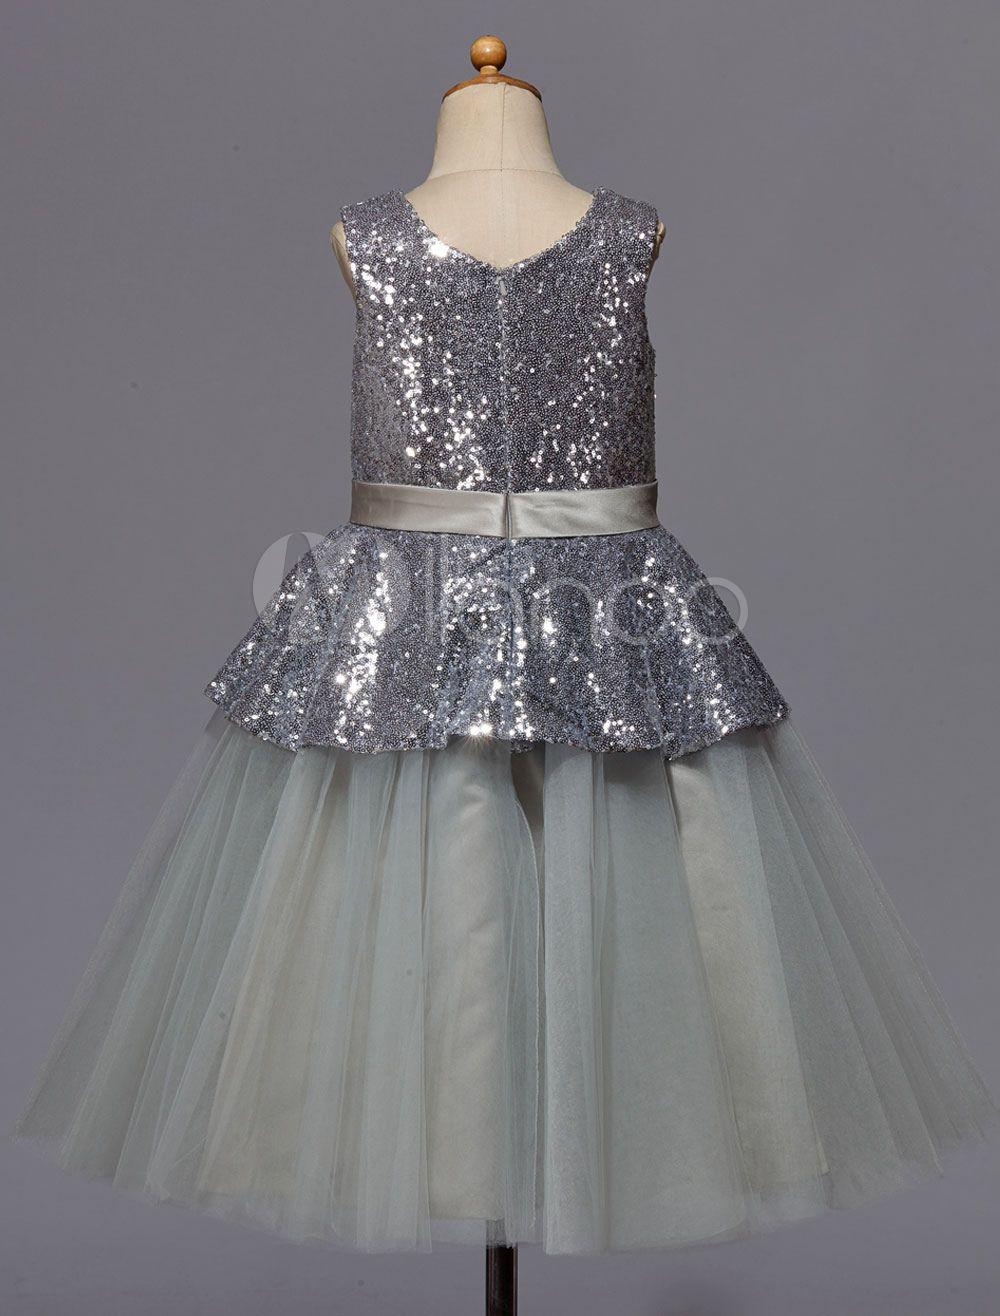 bd7c89ad22cd Silver Flower Girl Dresses Next – DACC